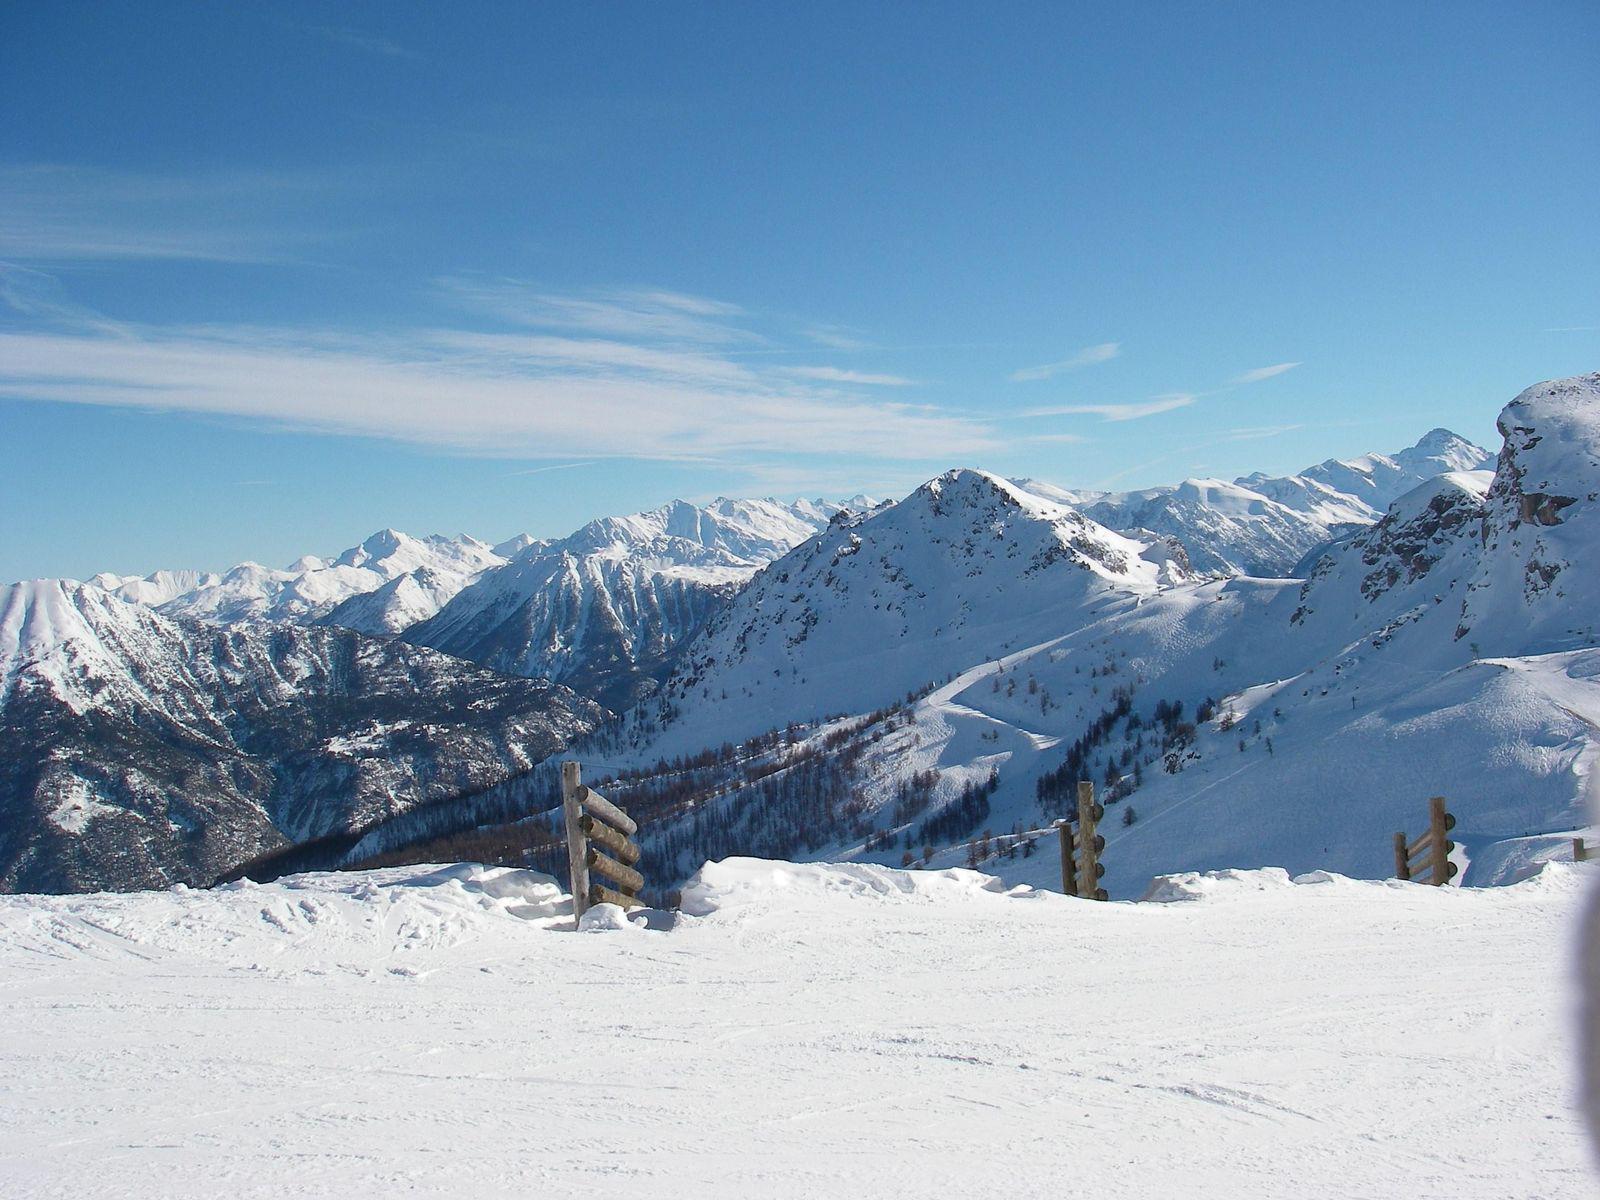 Domaine skiable SERRE CHEVALIER_Saint-Chaffrey